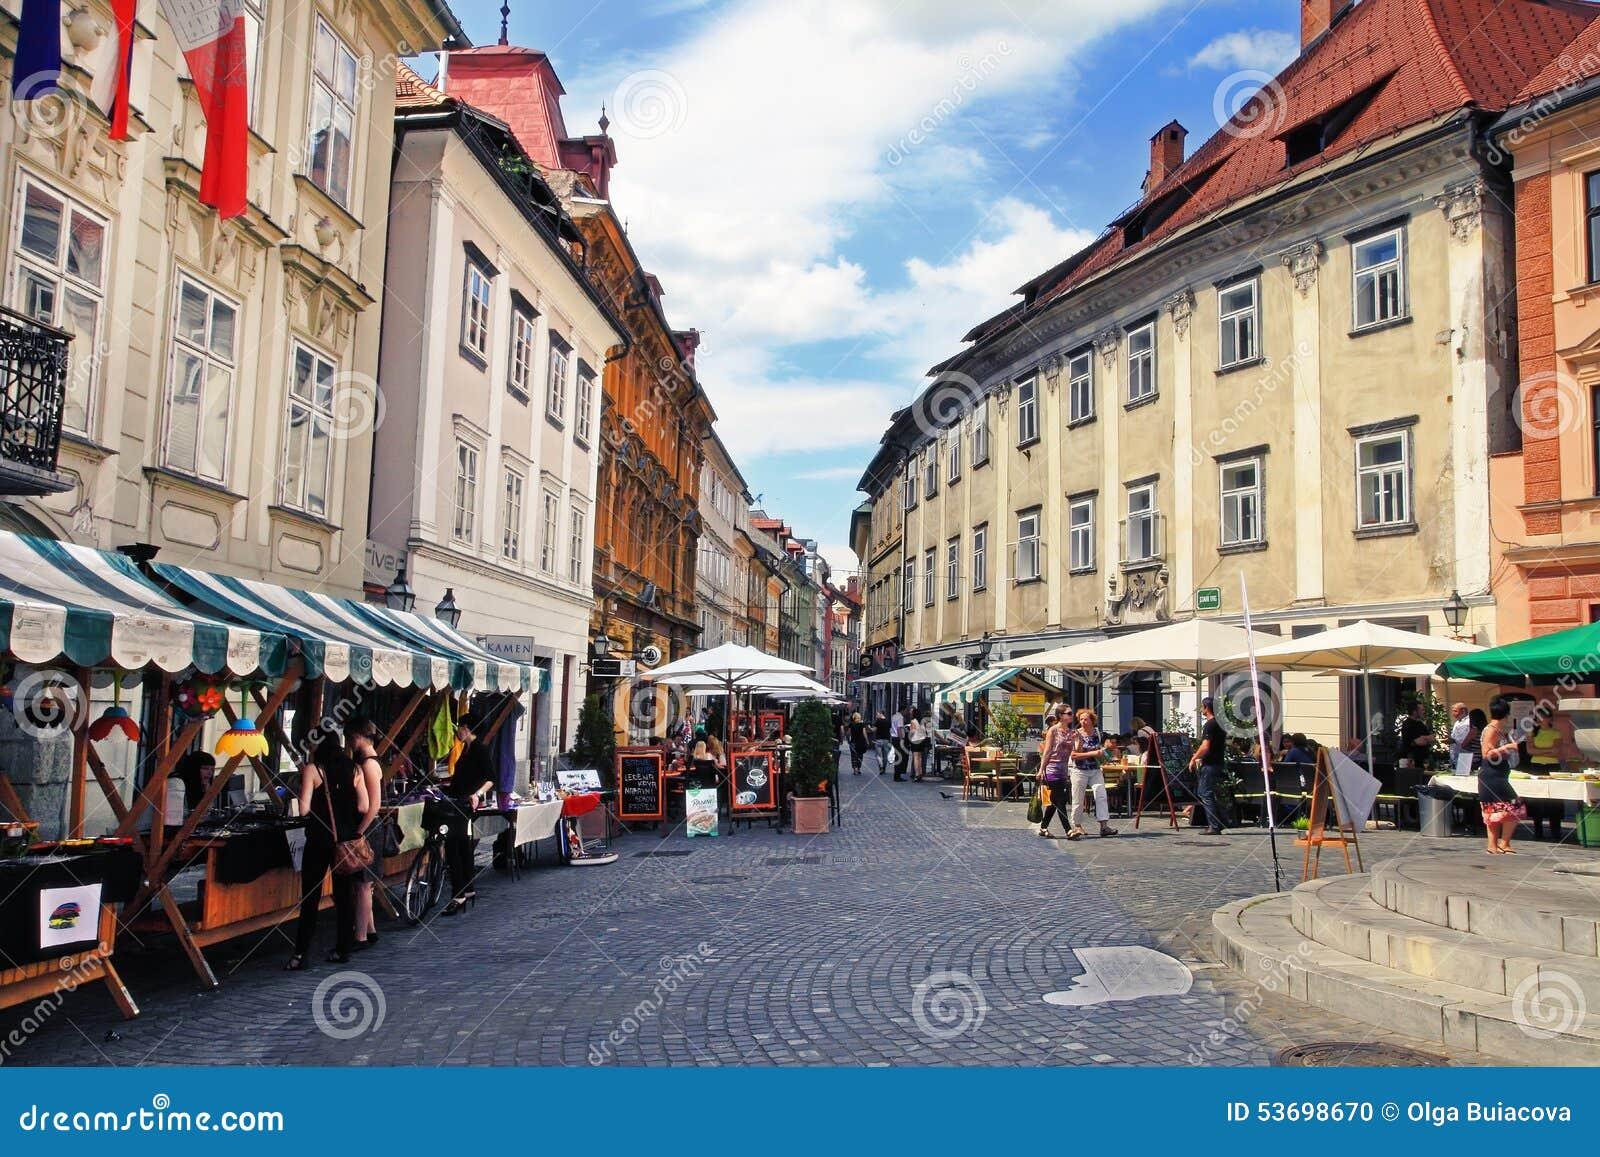 30 Beautiful Ljubljana Photos That Will Inspire You To Visit Slovenia's Capital City